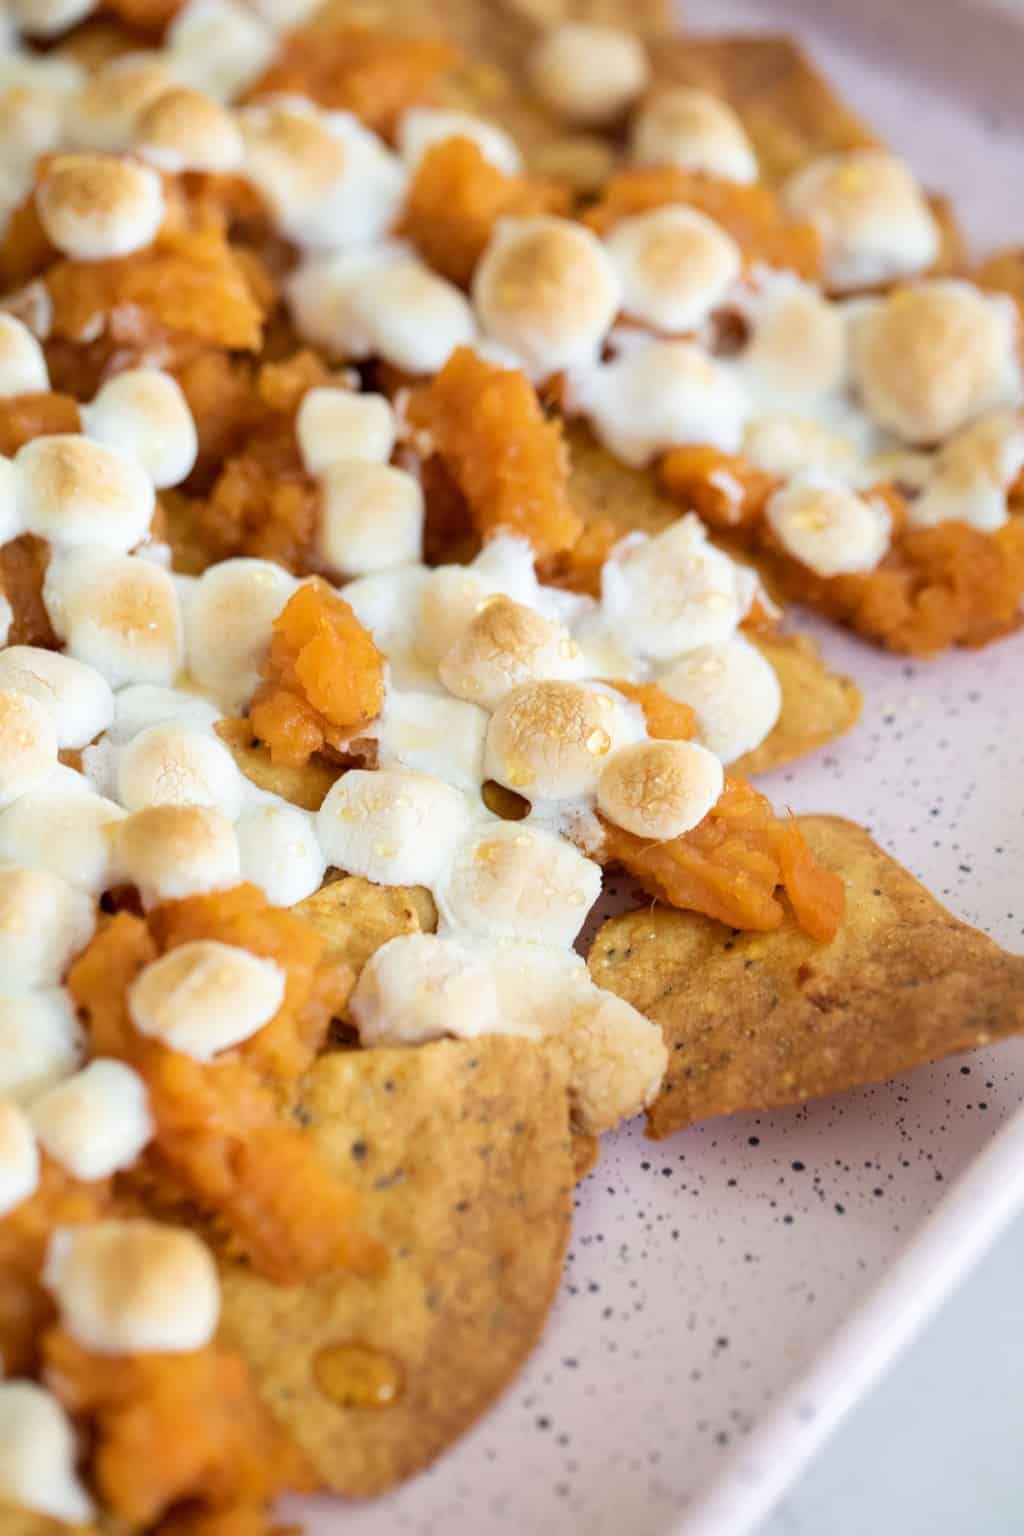 closeup photo of the sweet potatoes nachos recipe by top Houston lifestyle blogger Ashley Rose of Sugar & Cloth